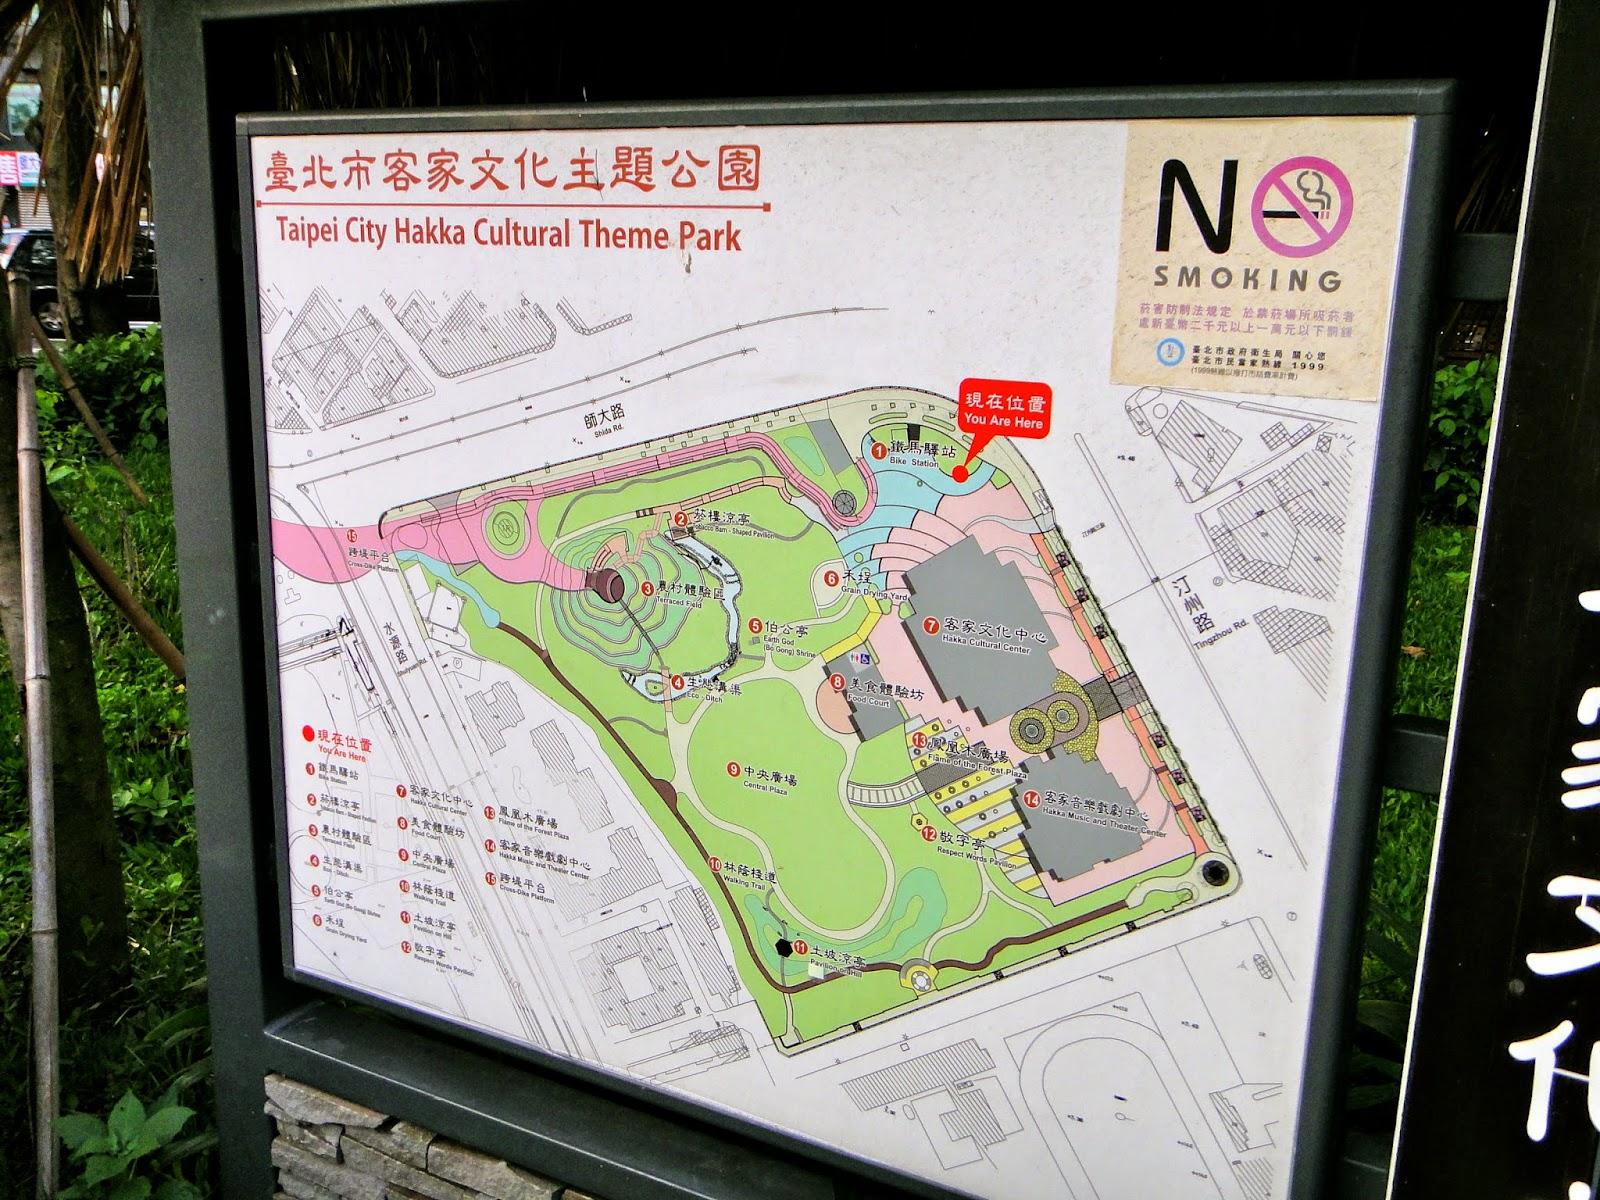 Taipei City Hakka Cultural Theme Park